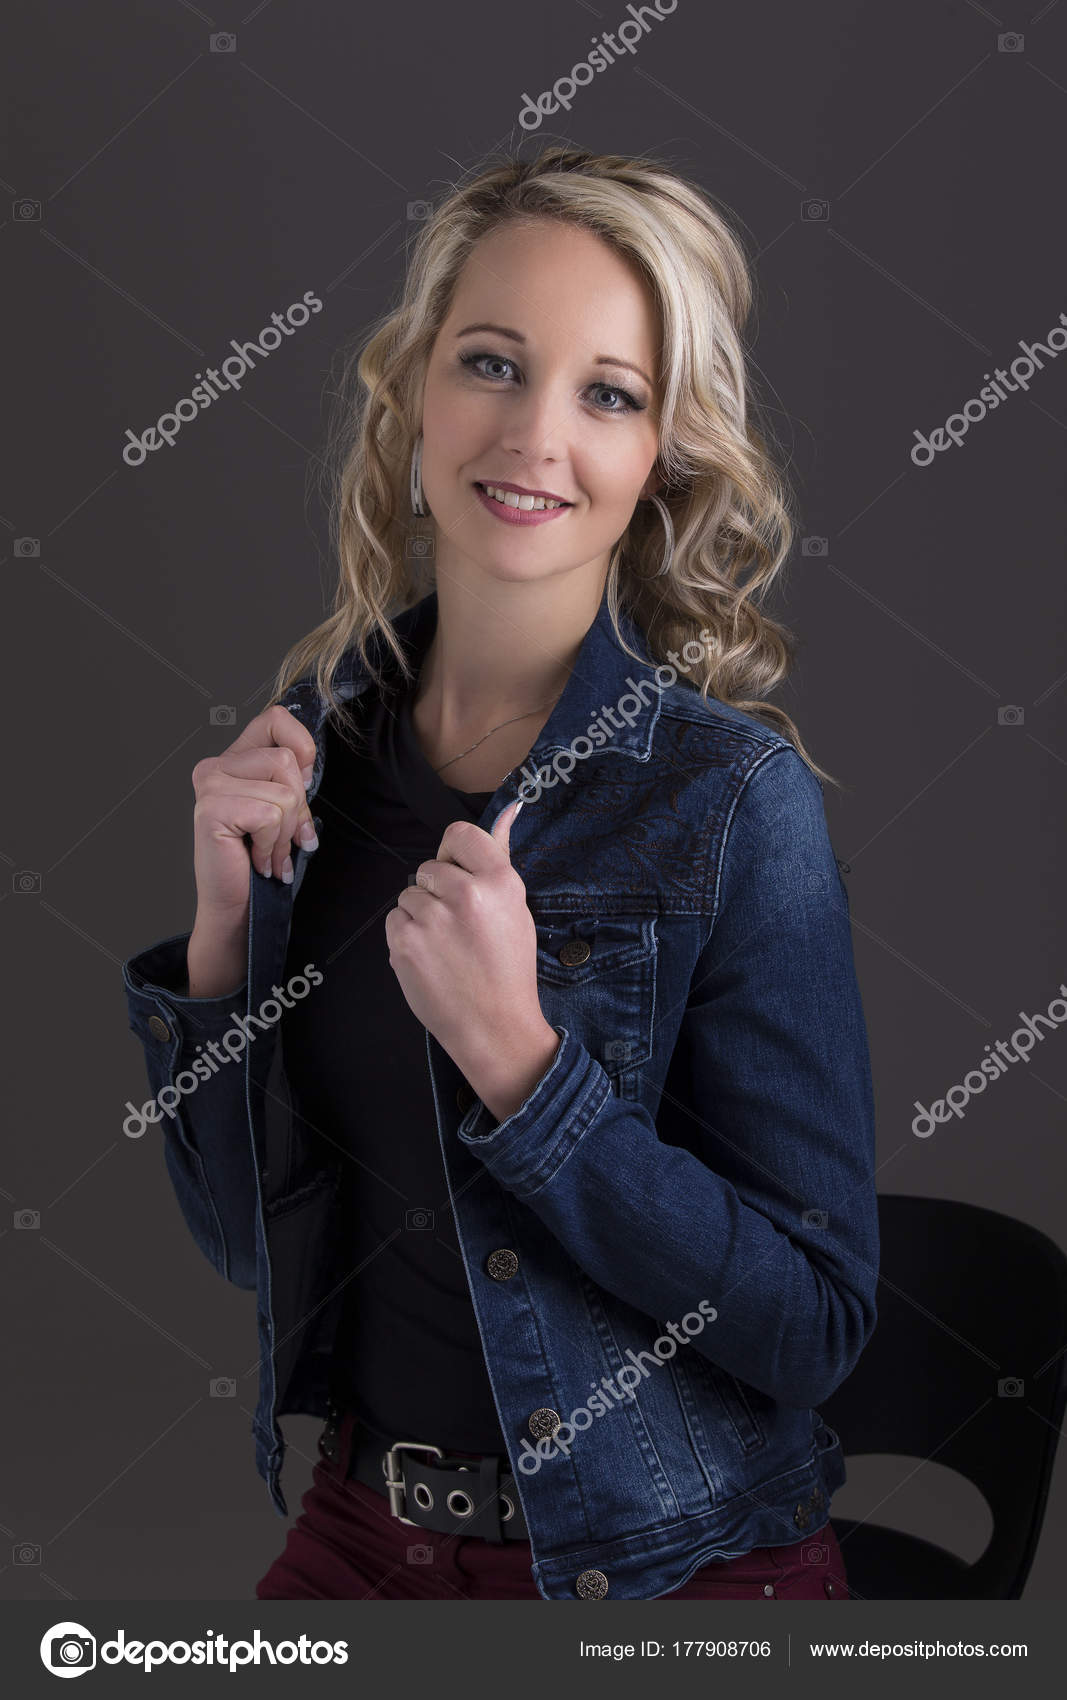 051fbb9e1246 Όμορφη ξανθιά γυναίκα στο σακάκι τζιν και μαύρη κορυφή στο σκοτάδι με  επιλεκτικό φωτισμό — Εικόνα από AOosthuizen. Βρείτε παρόμοιες εικόνες